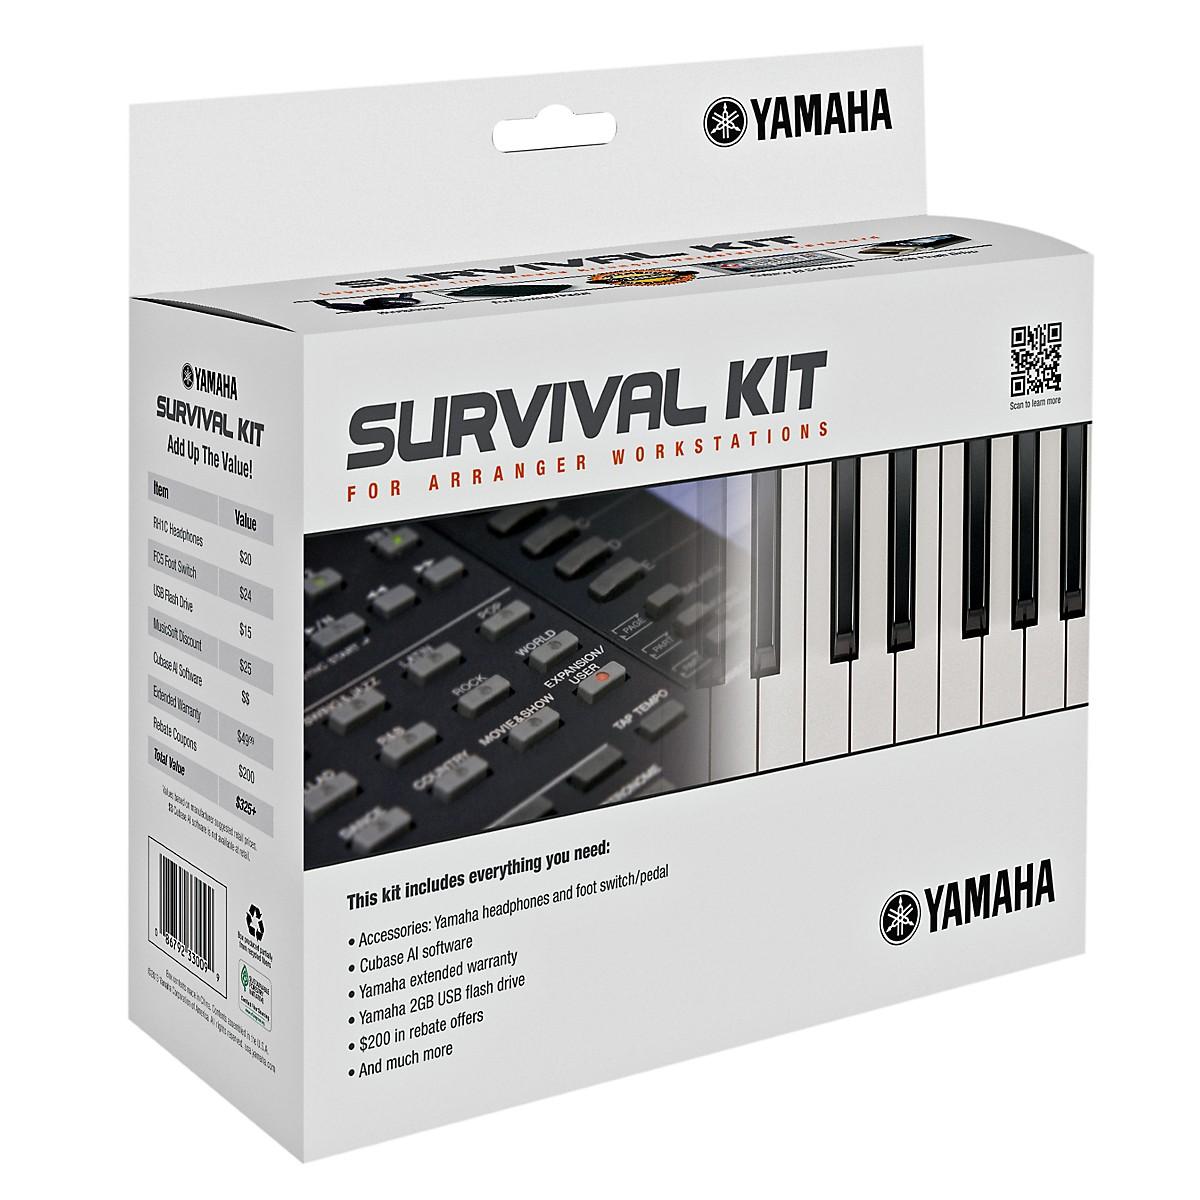 Yamaha Arranger Workstation Survival Kit  (PSRS650/PSRS750/PSRS950/PSRA2000/TYROS4)